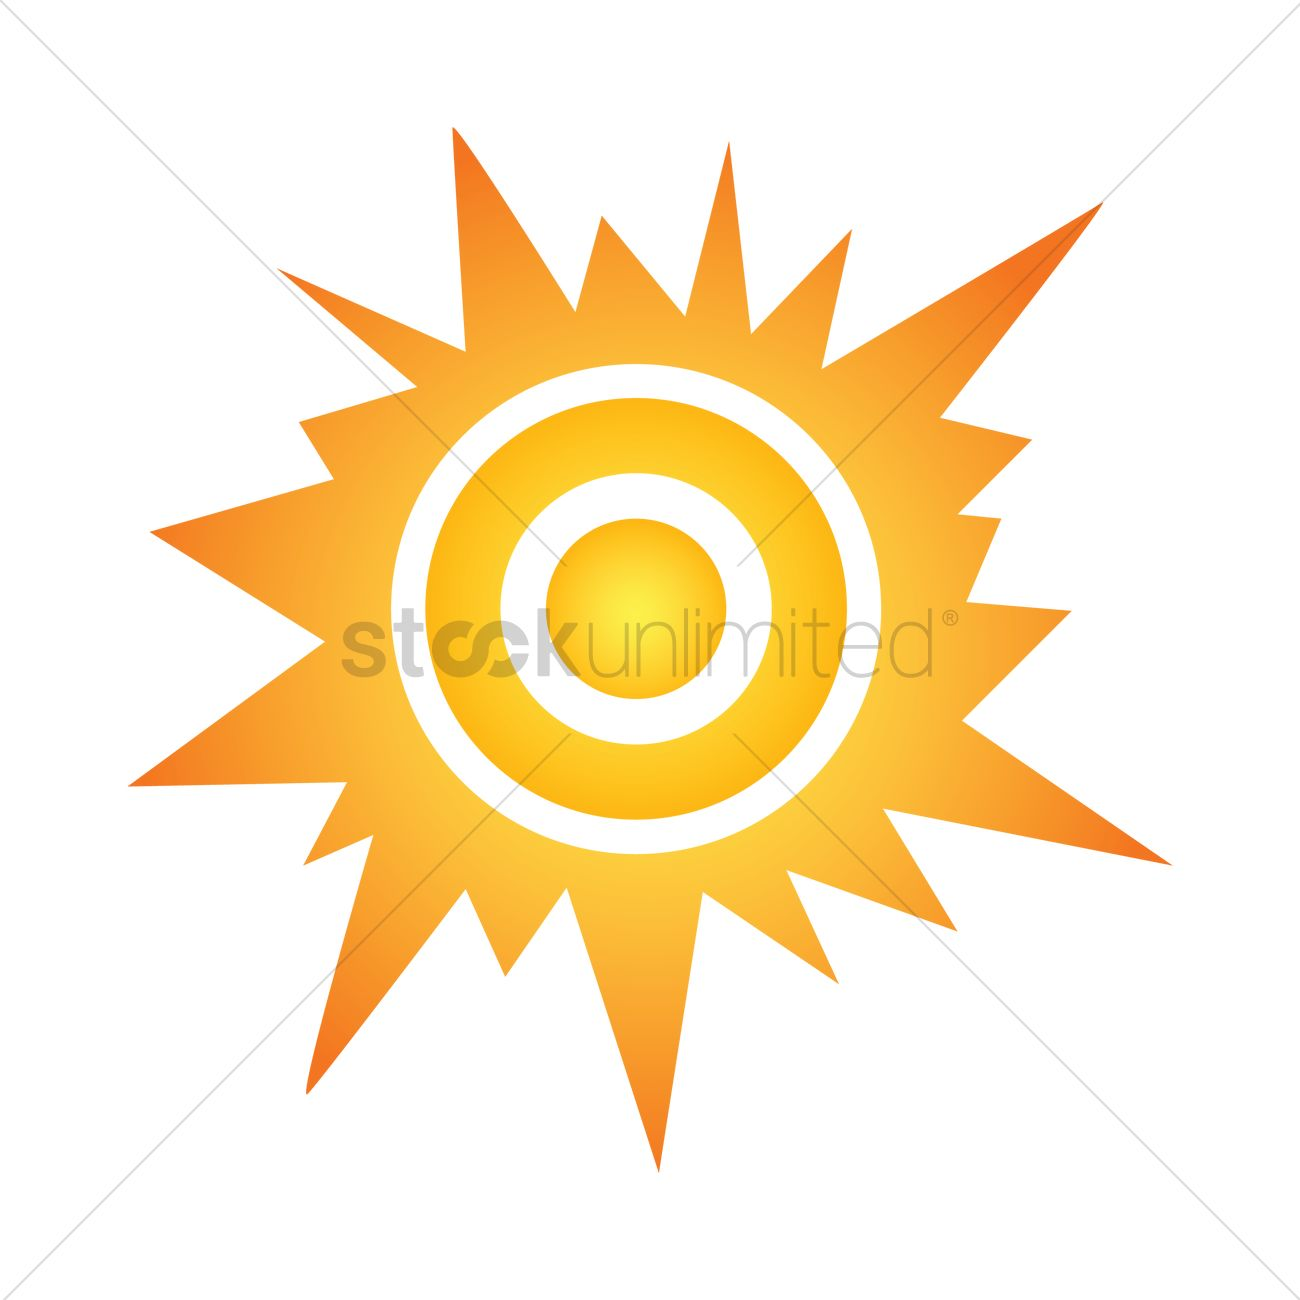 Sun logo element vector image 2019463 stockunlimited sun logo element vector graphic buycottarizona Images